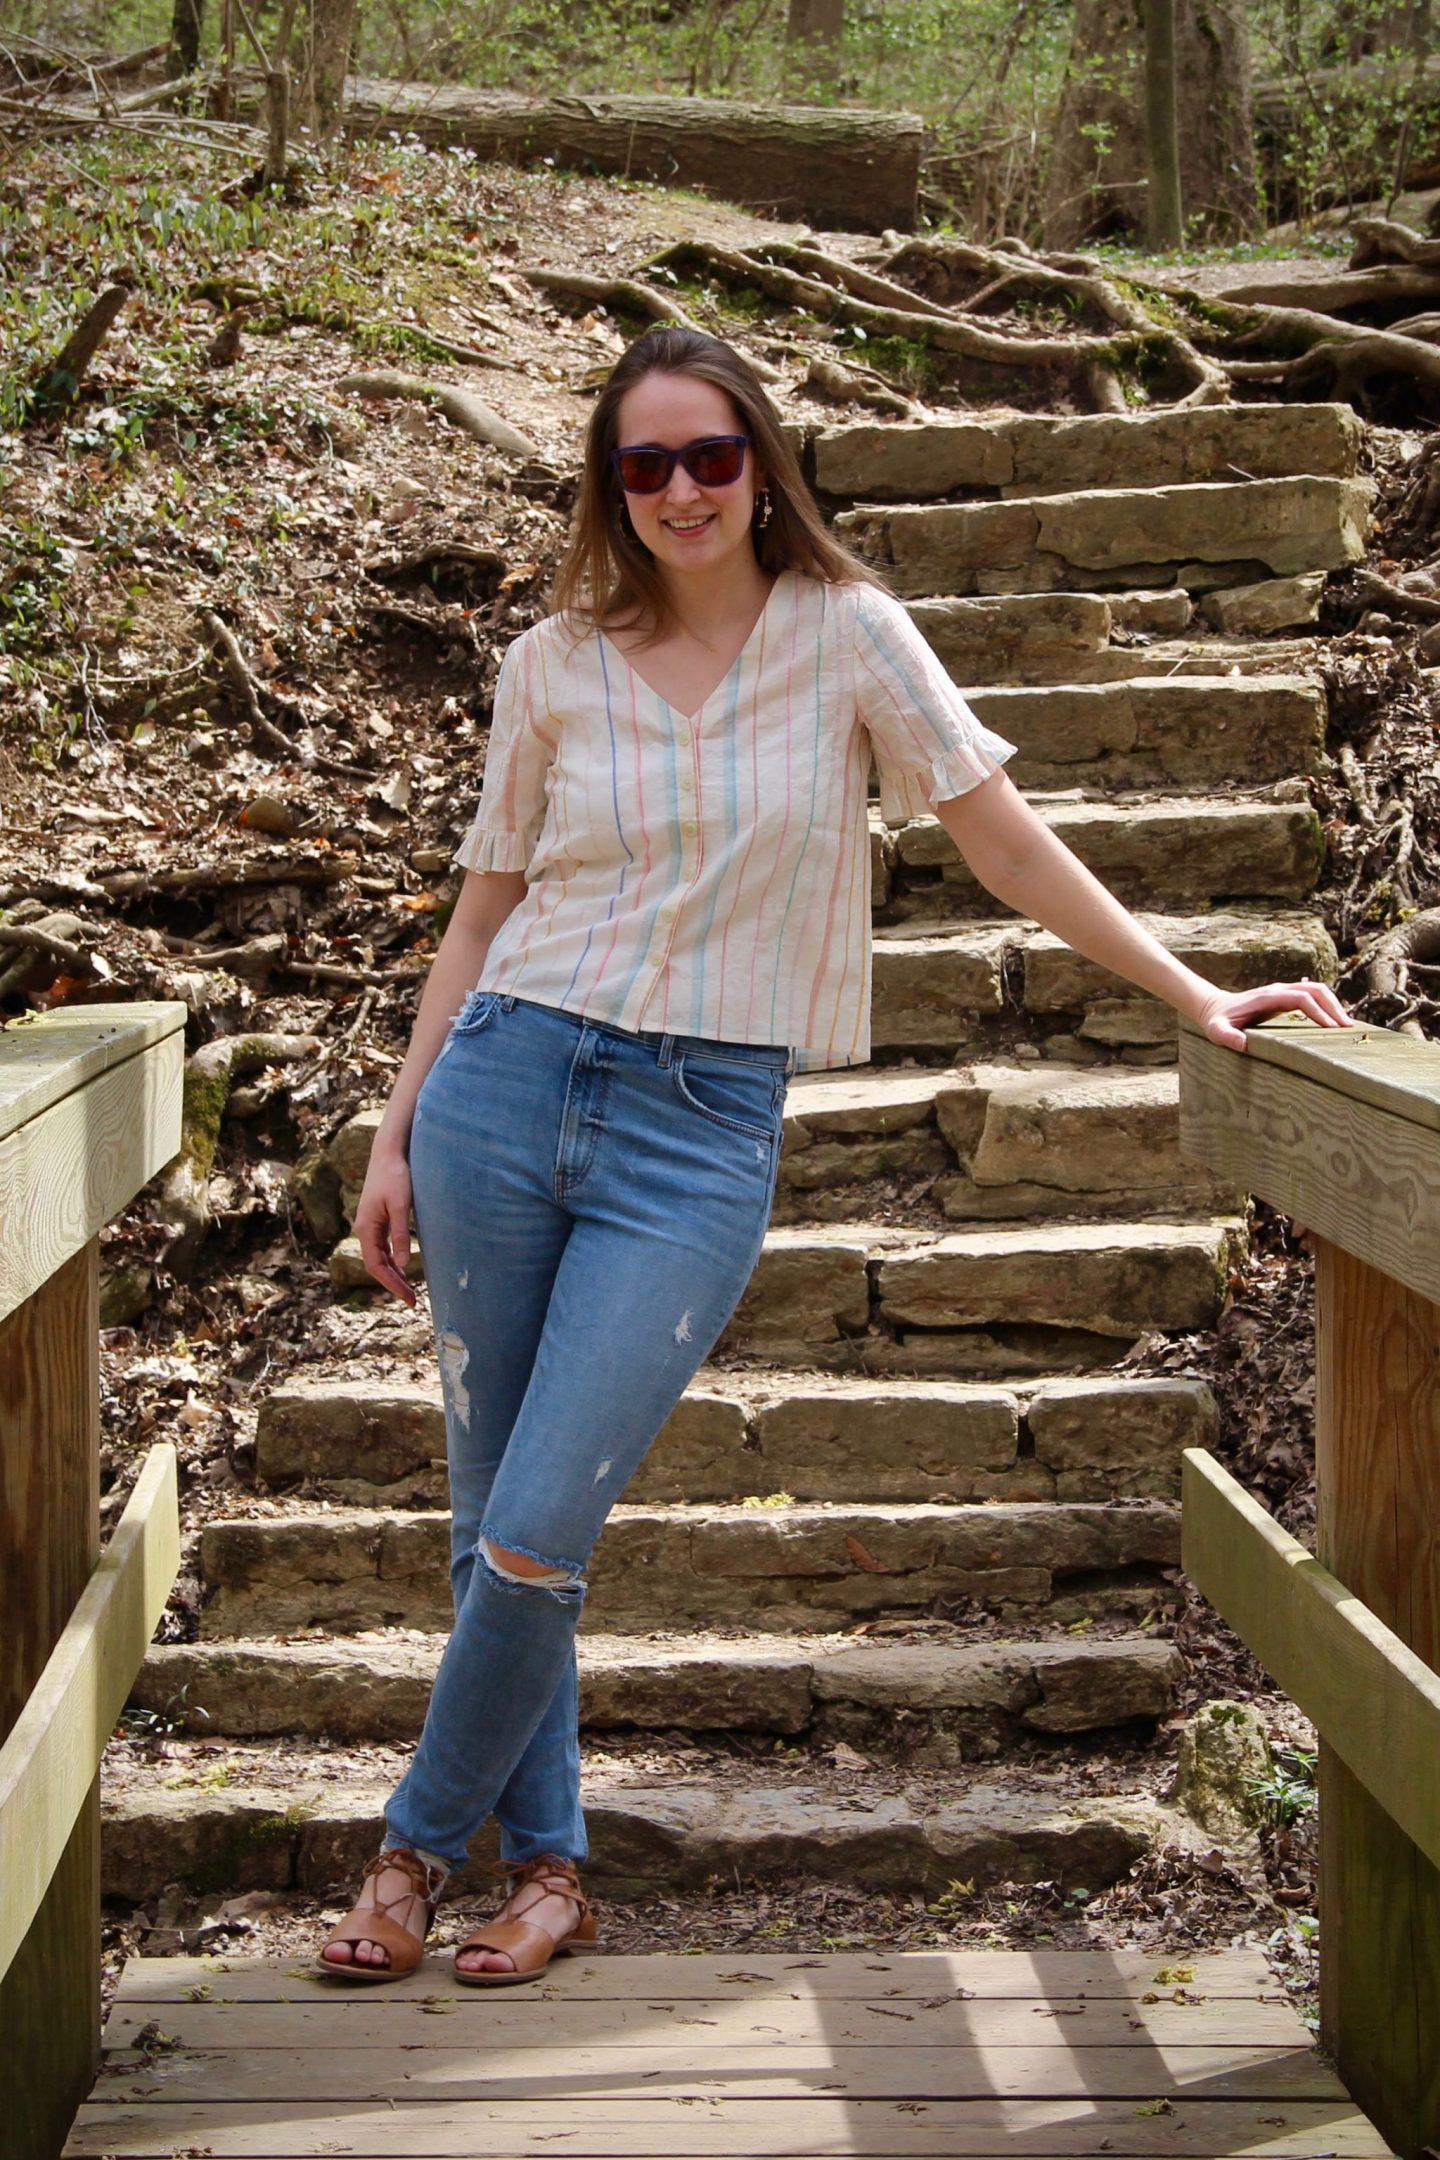 Classic Spring Style ... Cincinnati Parks ... The Spectacular Adventurer